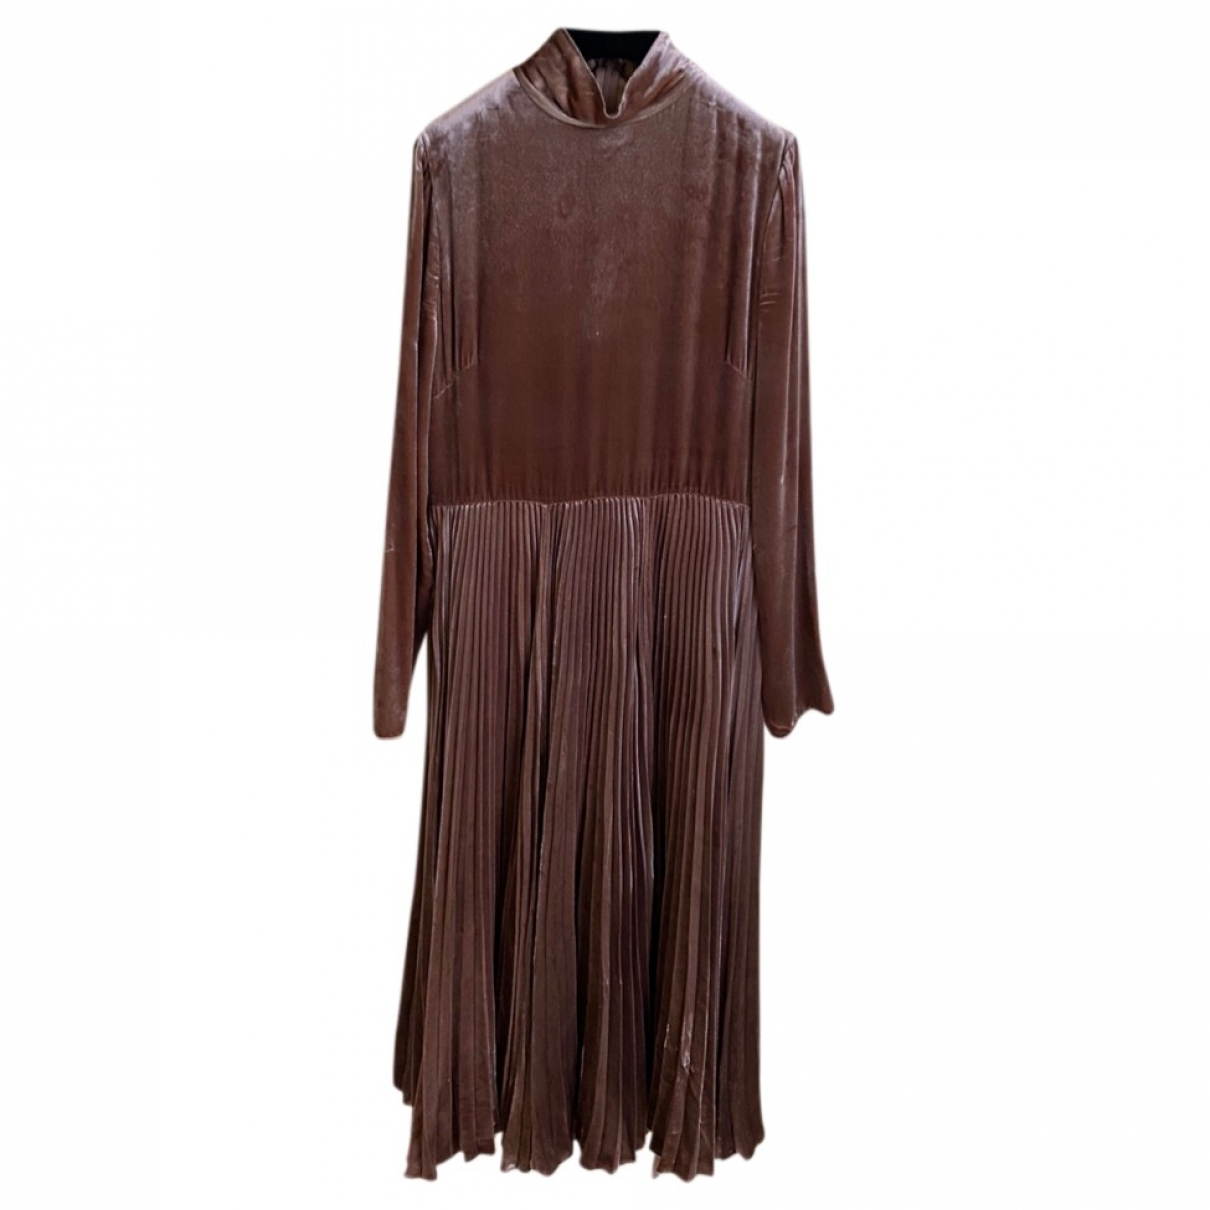 Valentino Garavani \N Kleid in  Kamel Polyester